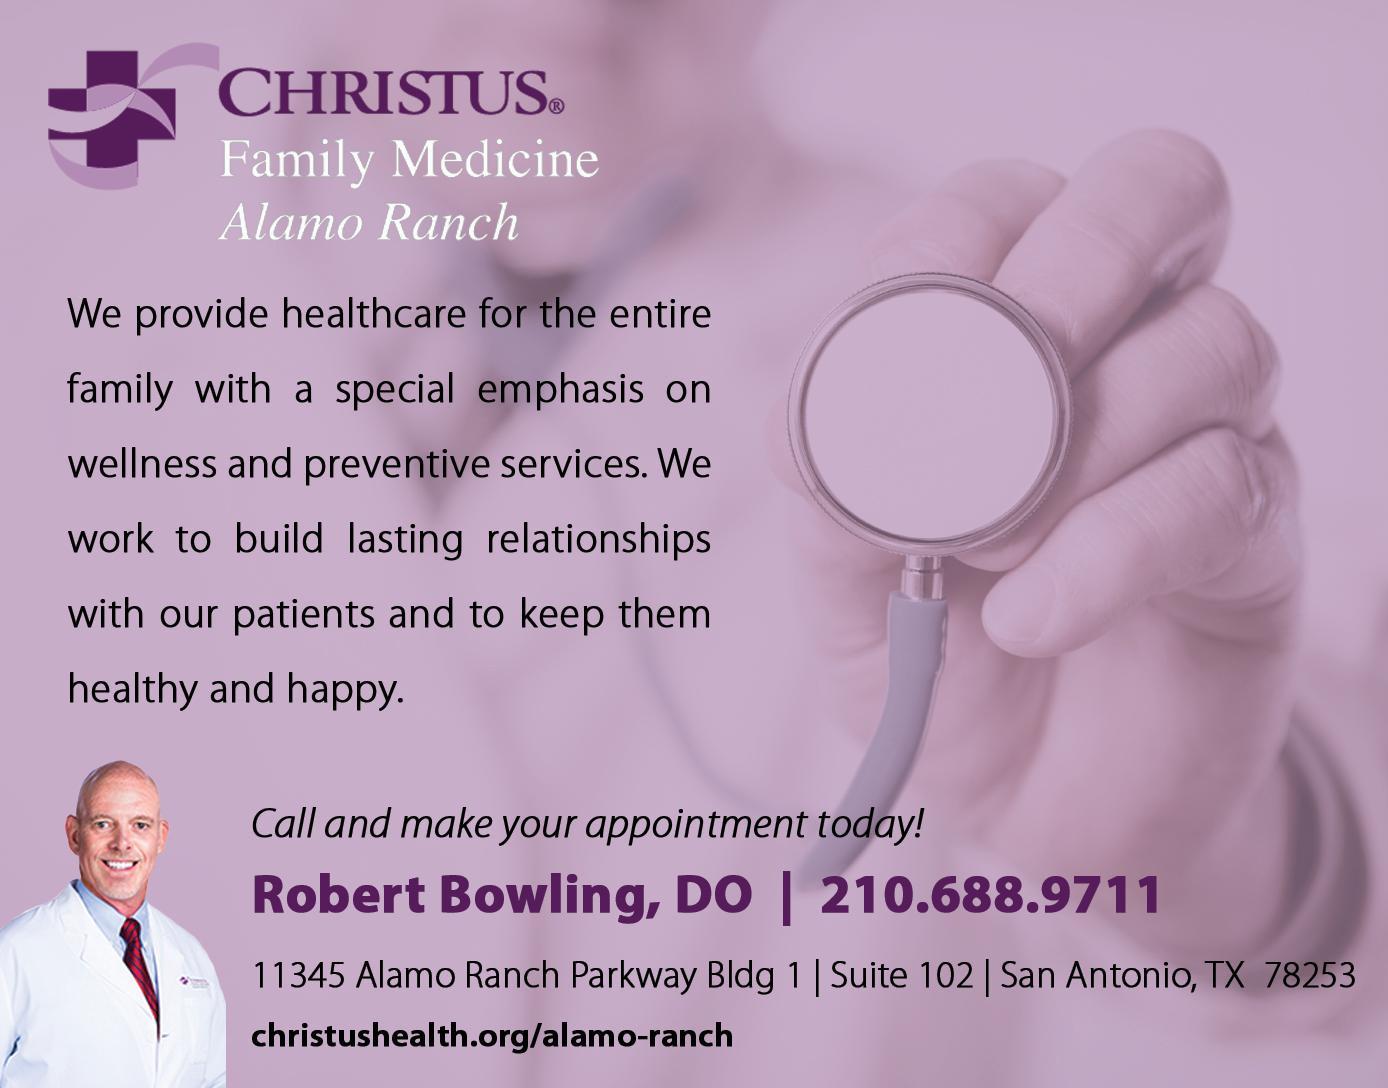 Christus Family Medicine-Alamo Ranch